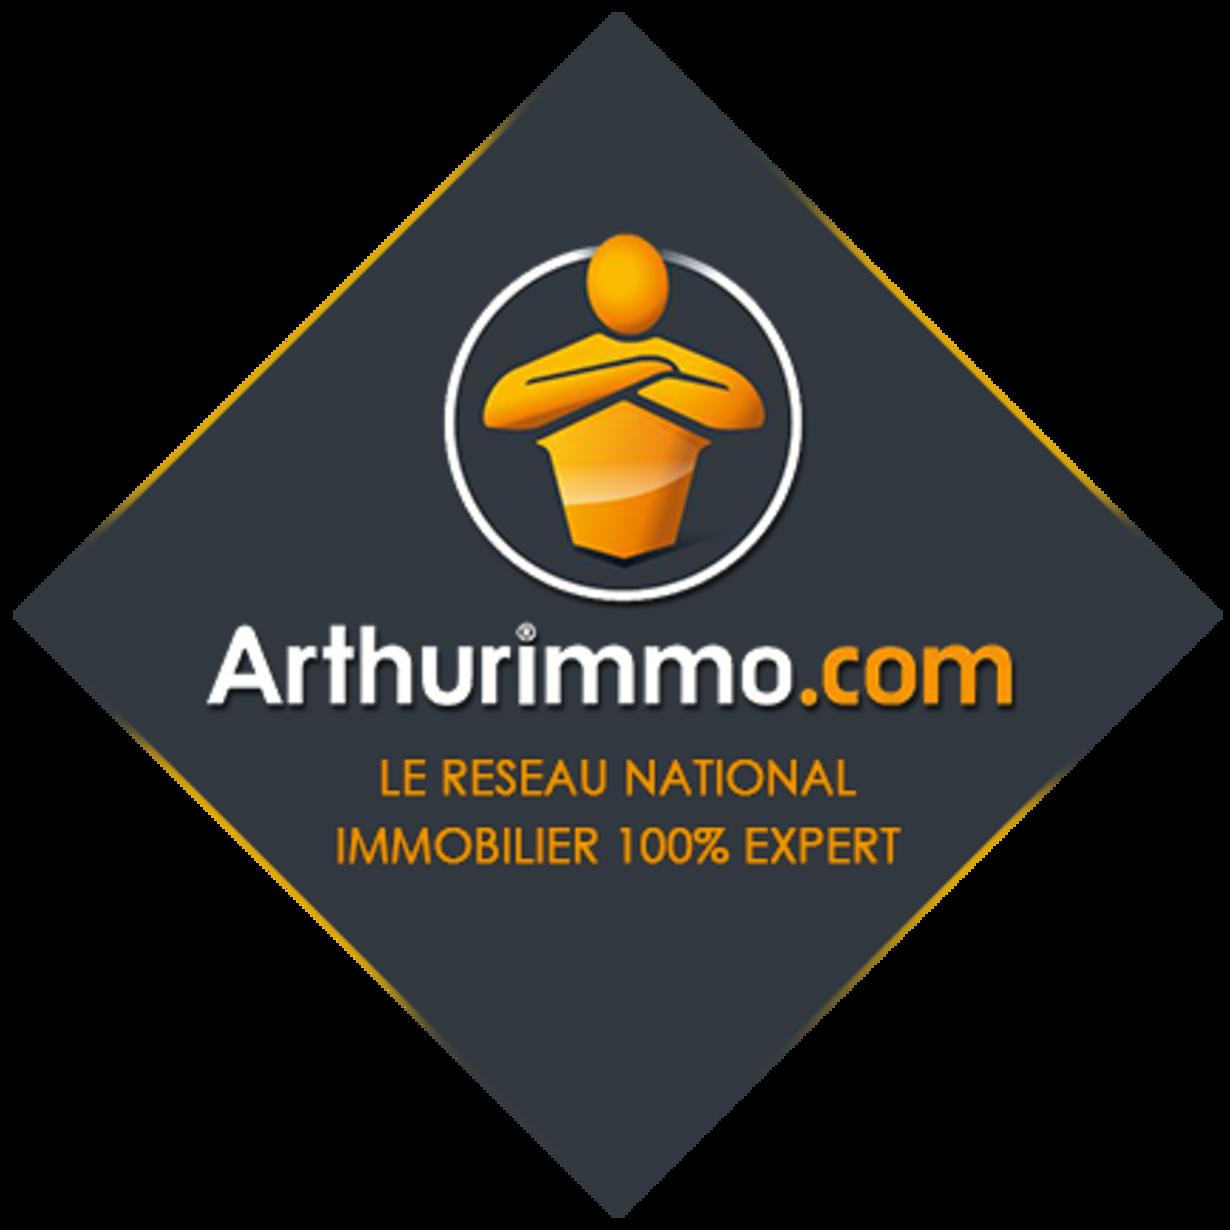 arthur immo guingamp